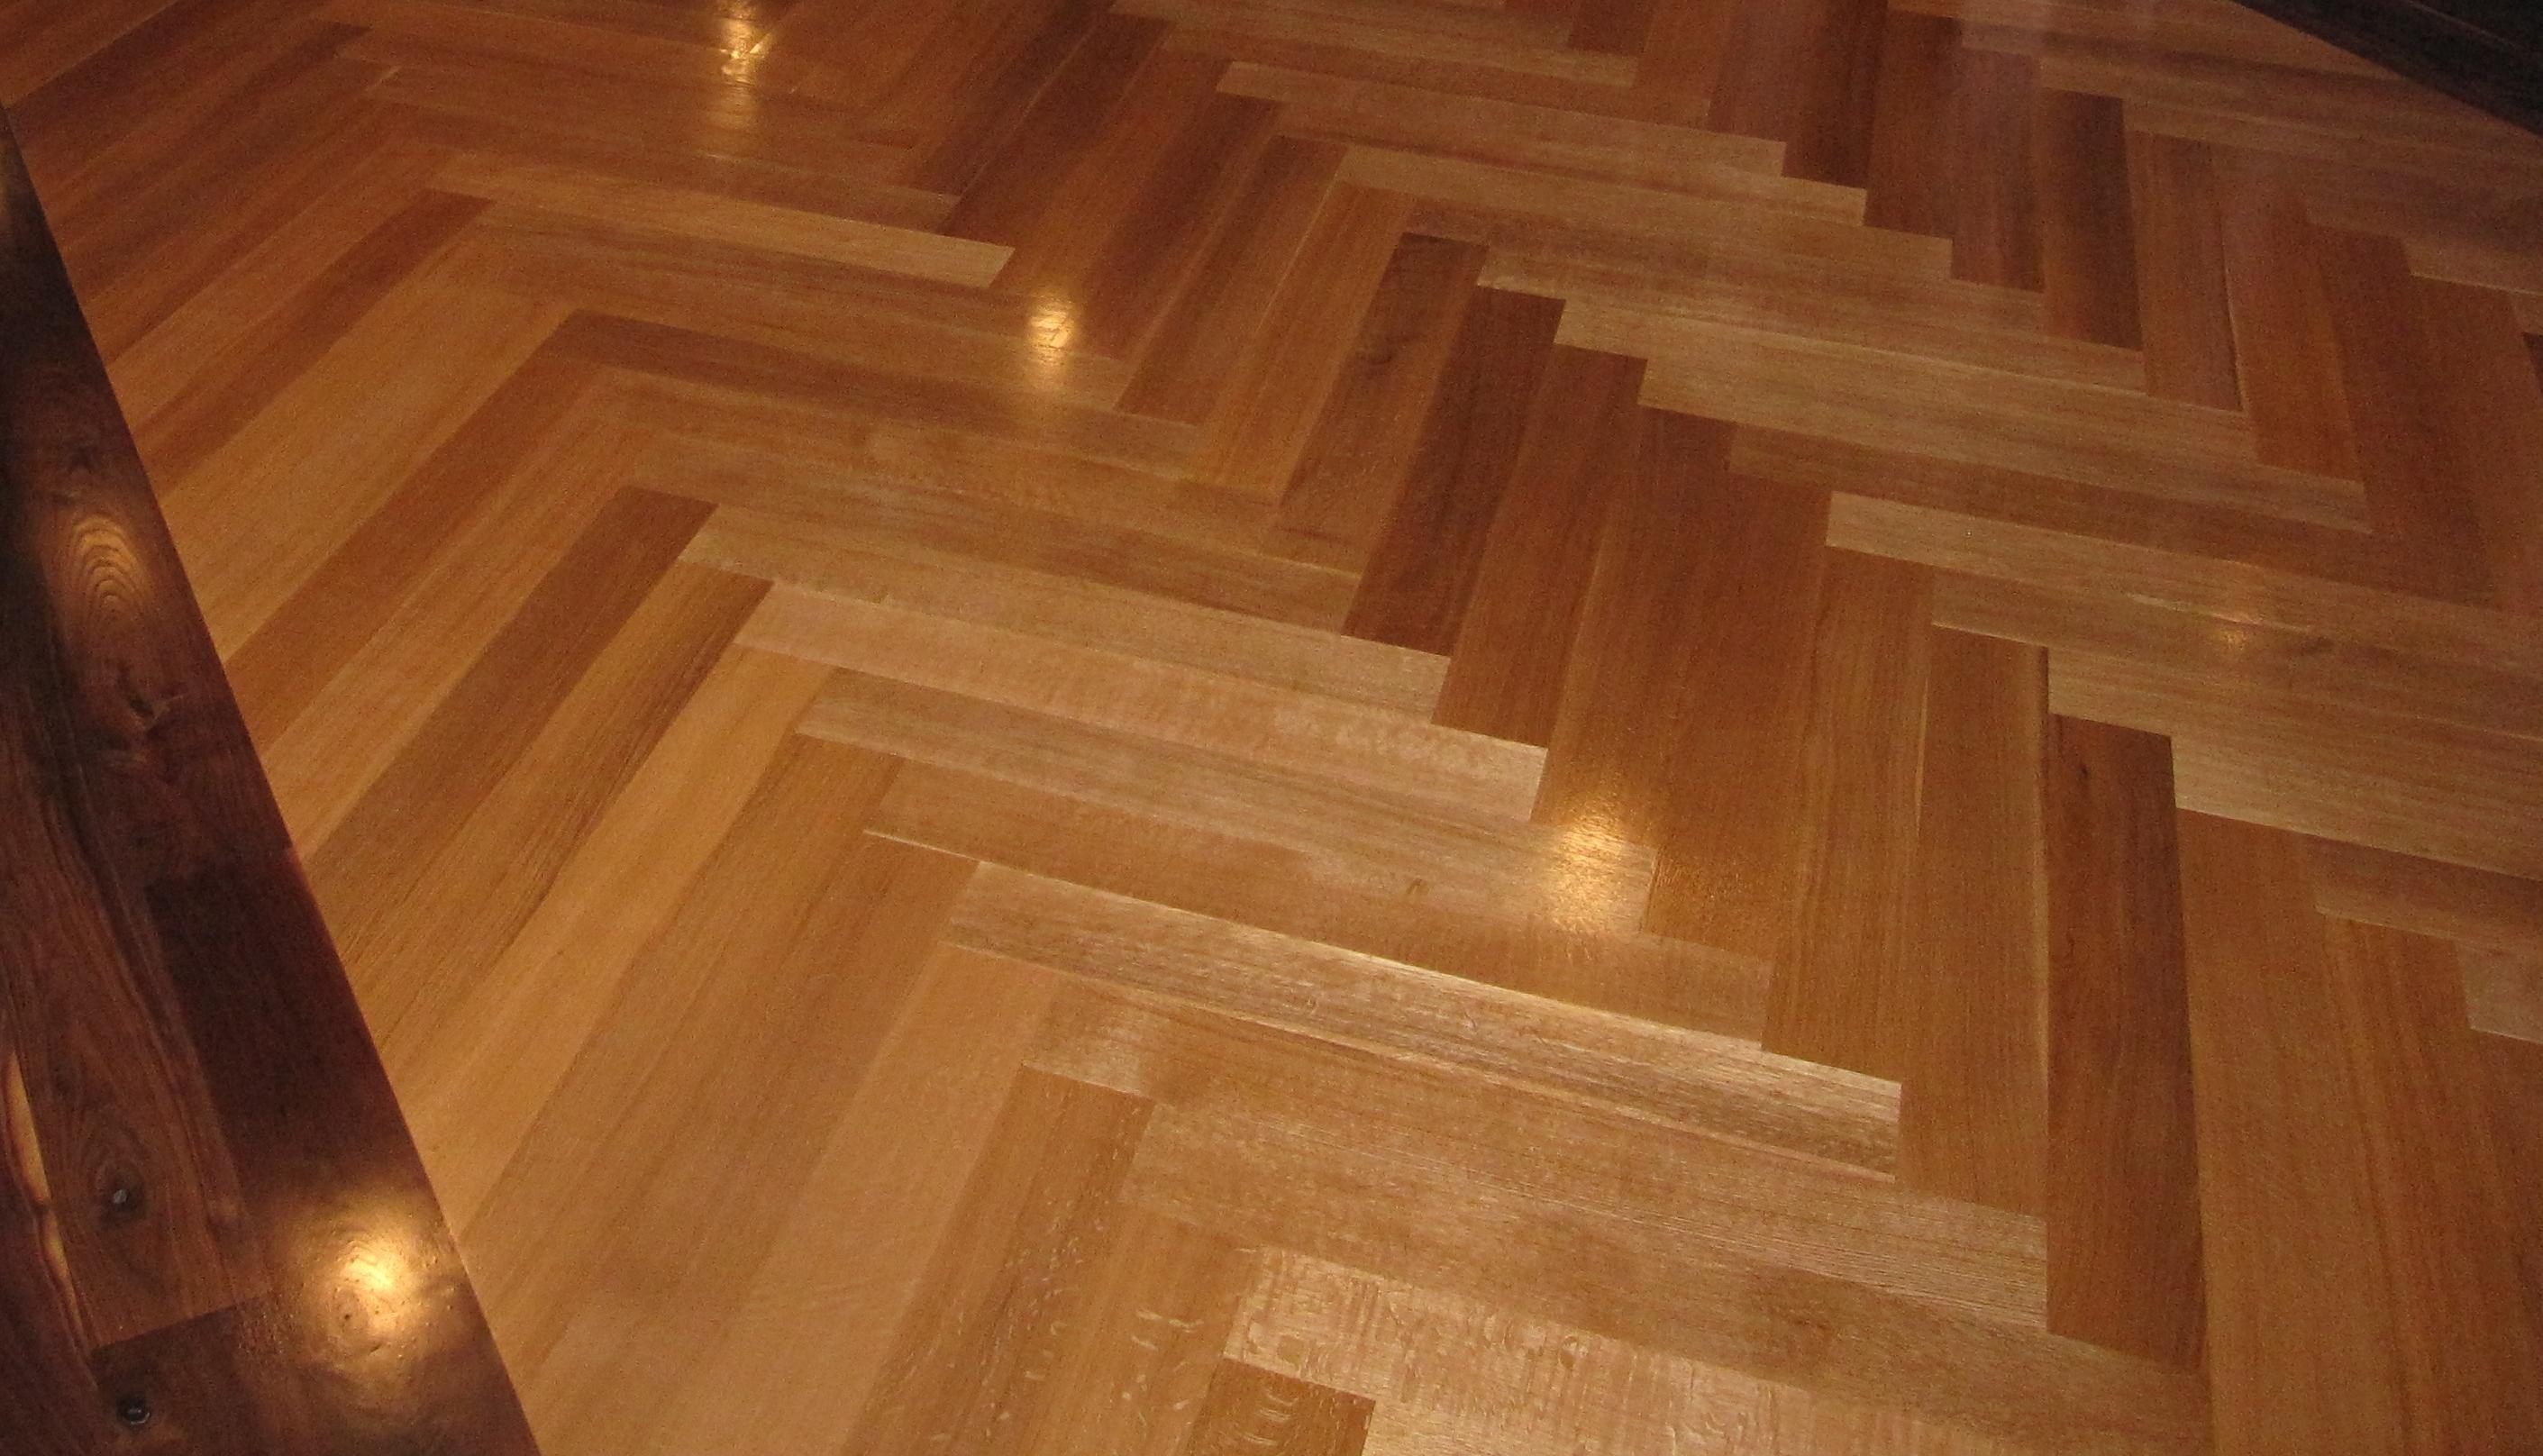 Engineered wood flooring uk sale - 17 Best Images About Ars Wooden Flooring On Pinterest Herringbone Wooden Flooring And India